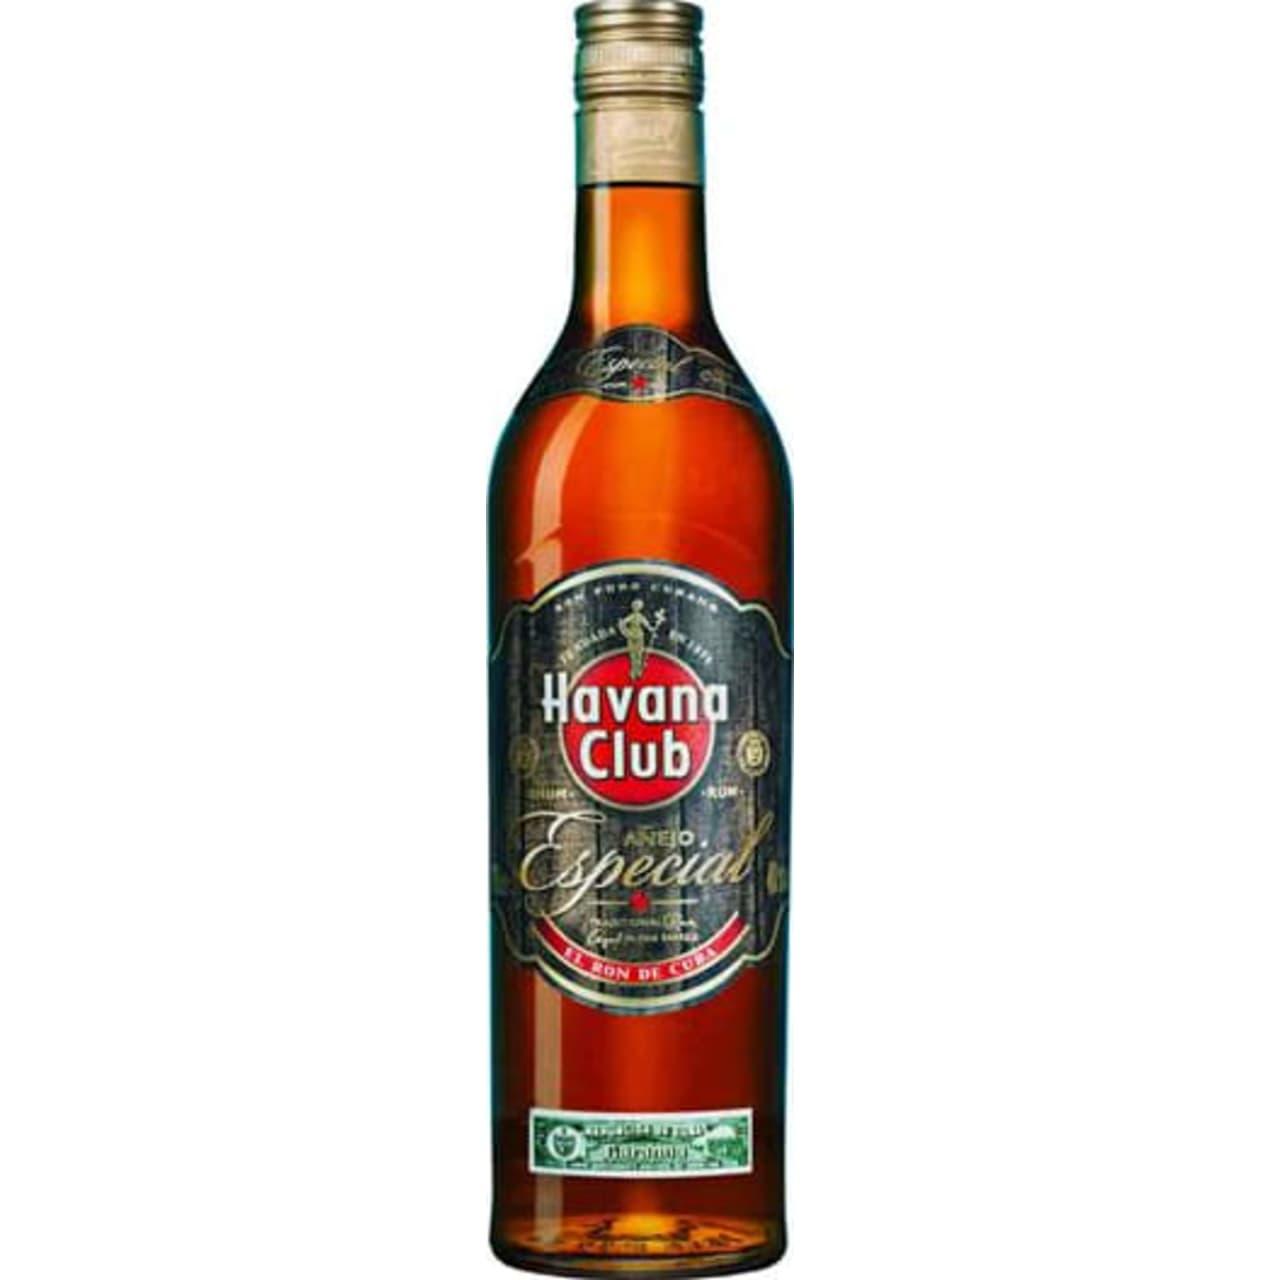 Product Image - Havana Club Añejo Especial Rum